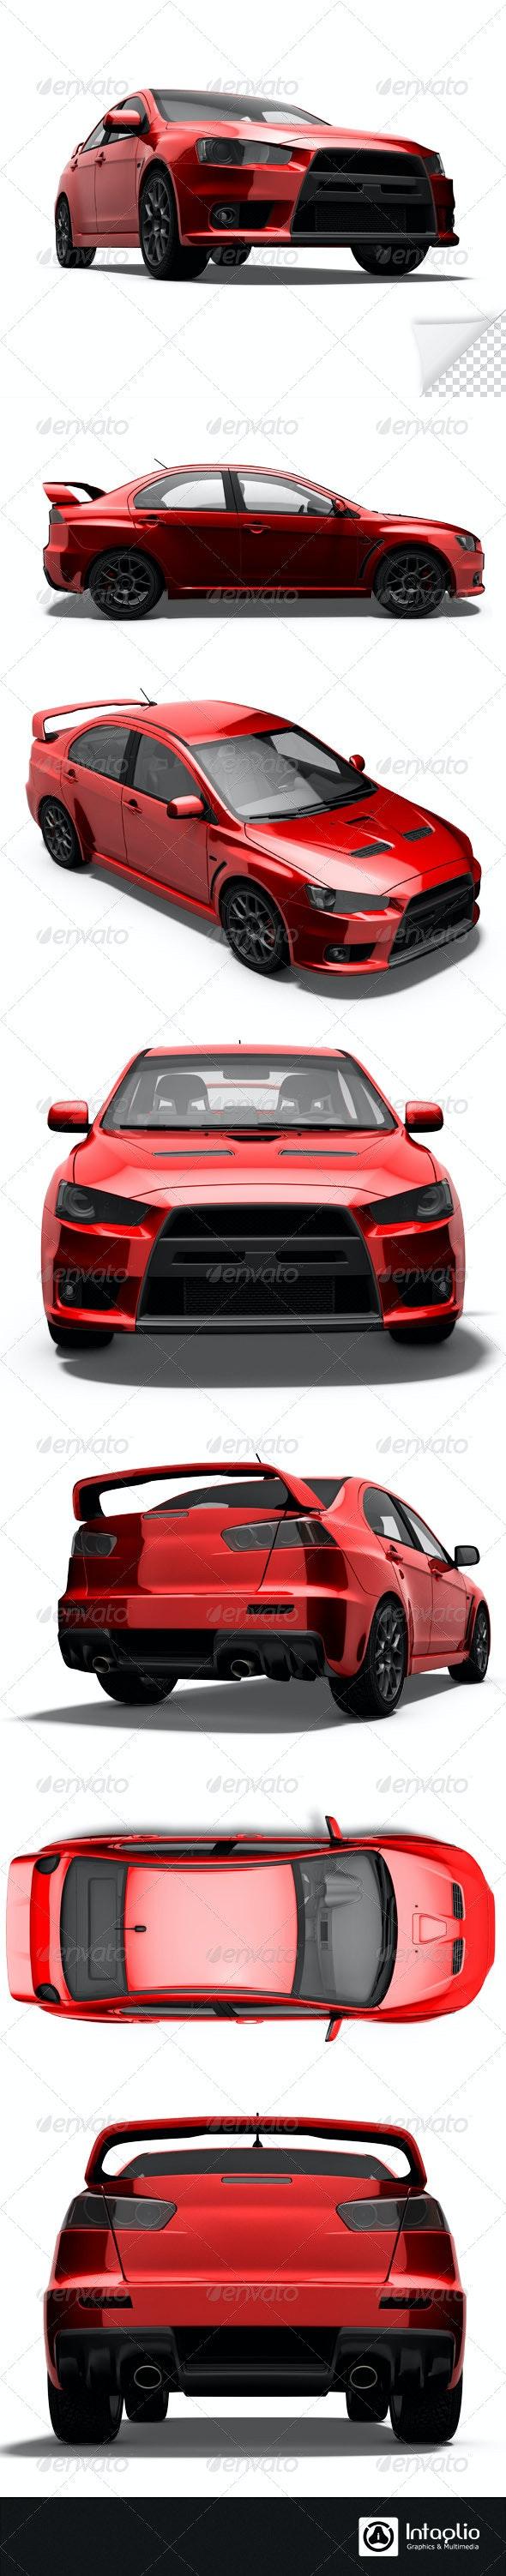 Red Rally Cars Render Bundle - 3D Renders Graphics